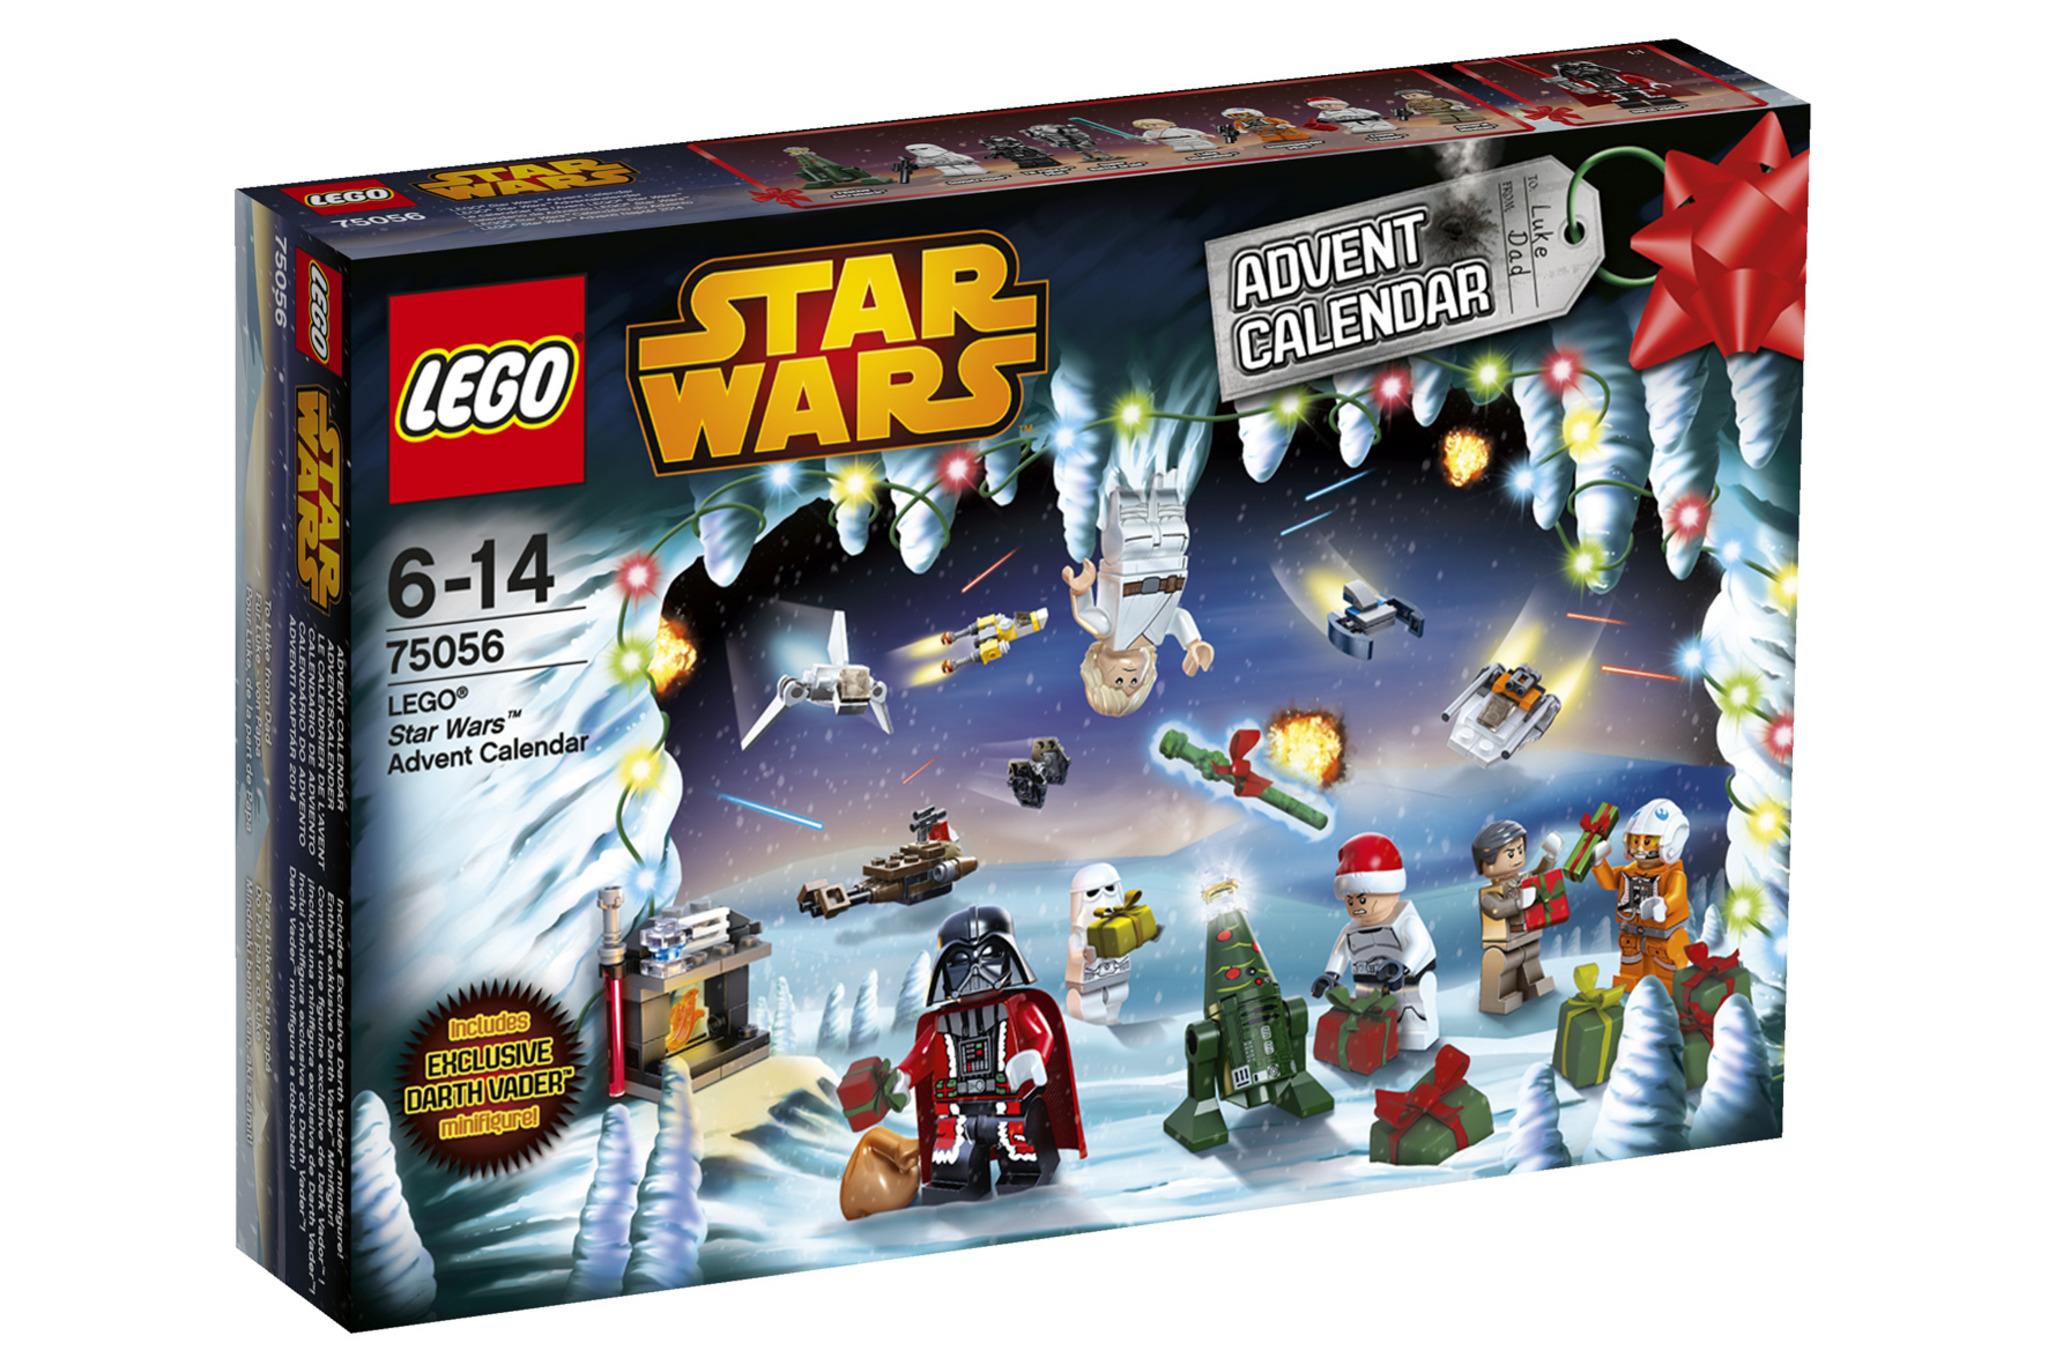 Gewinnspiel: 3 LEGO Adventkalender zu gewinnen - Wien